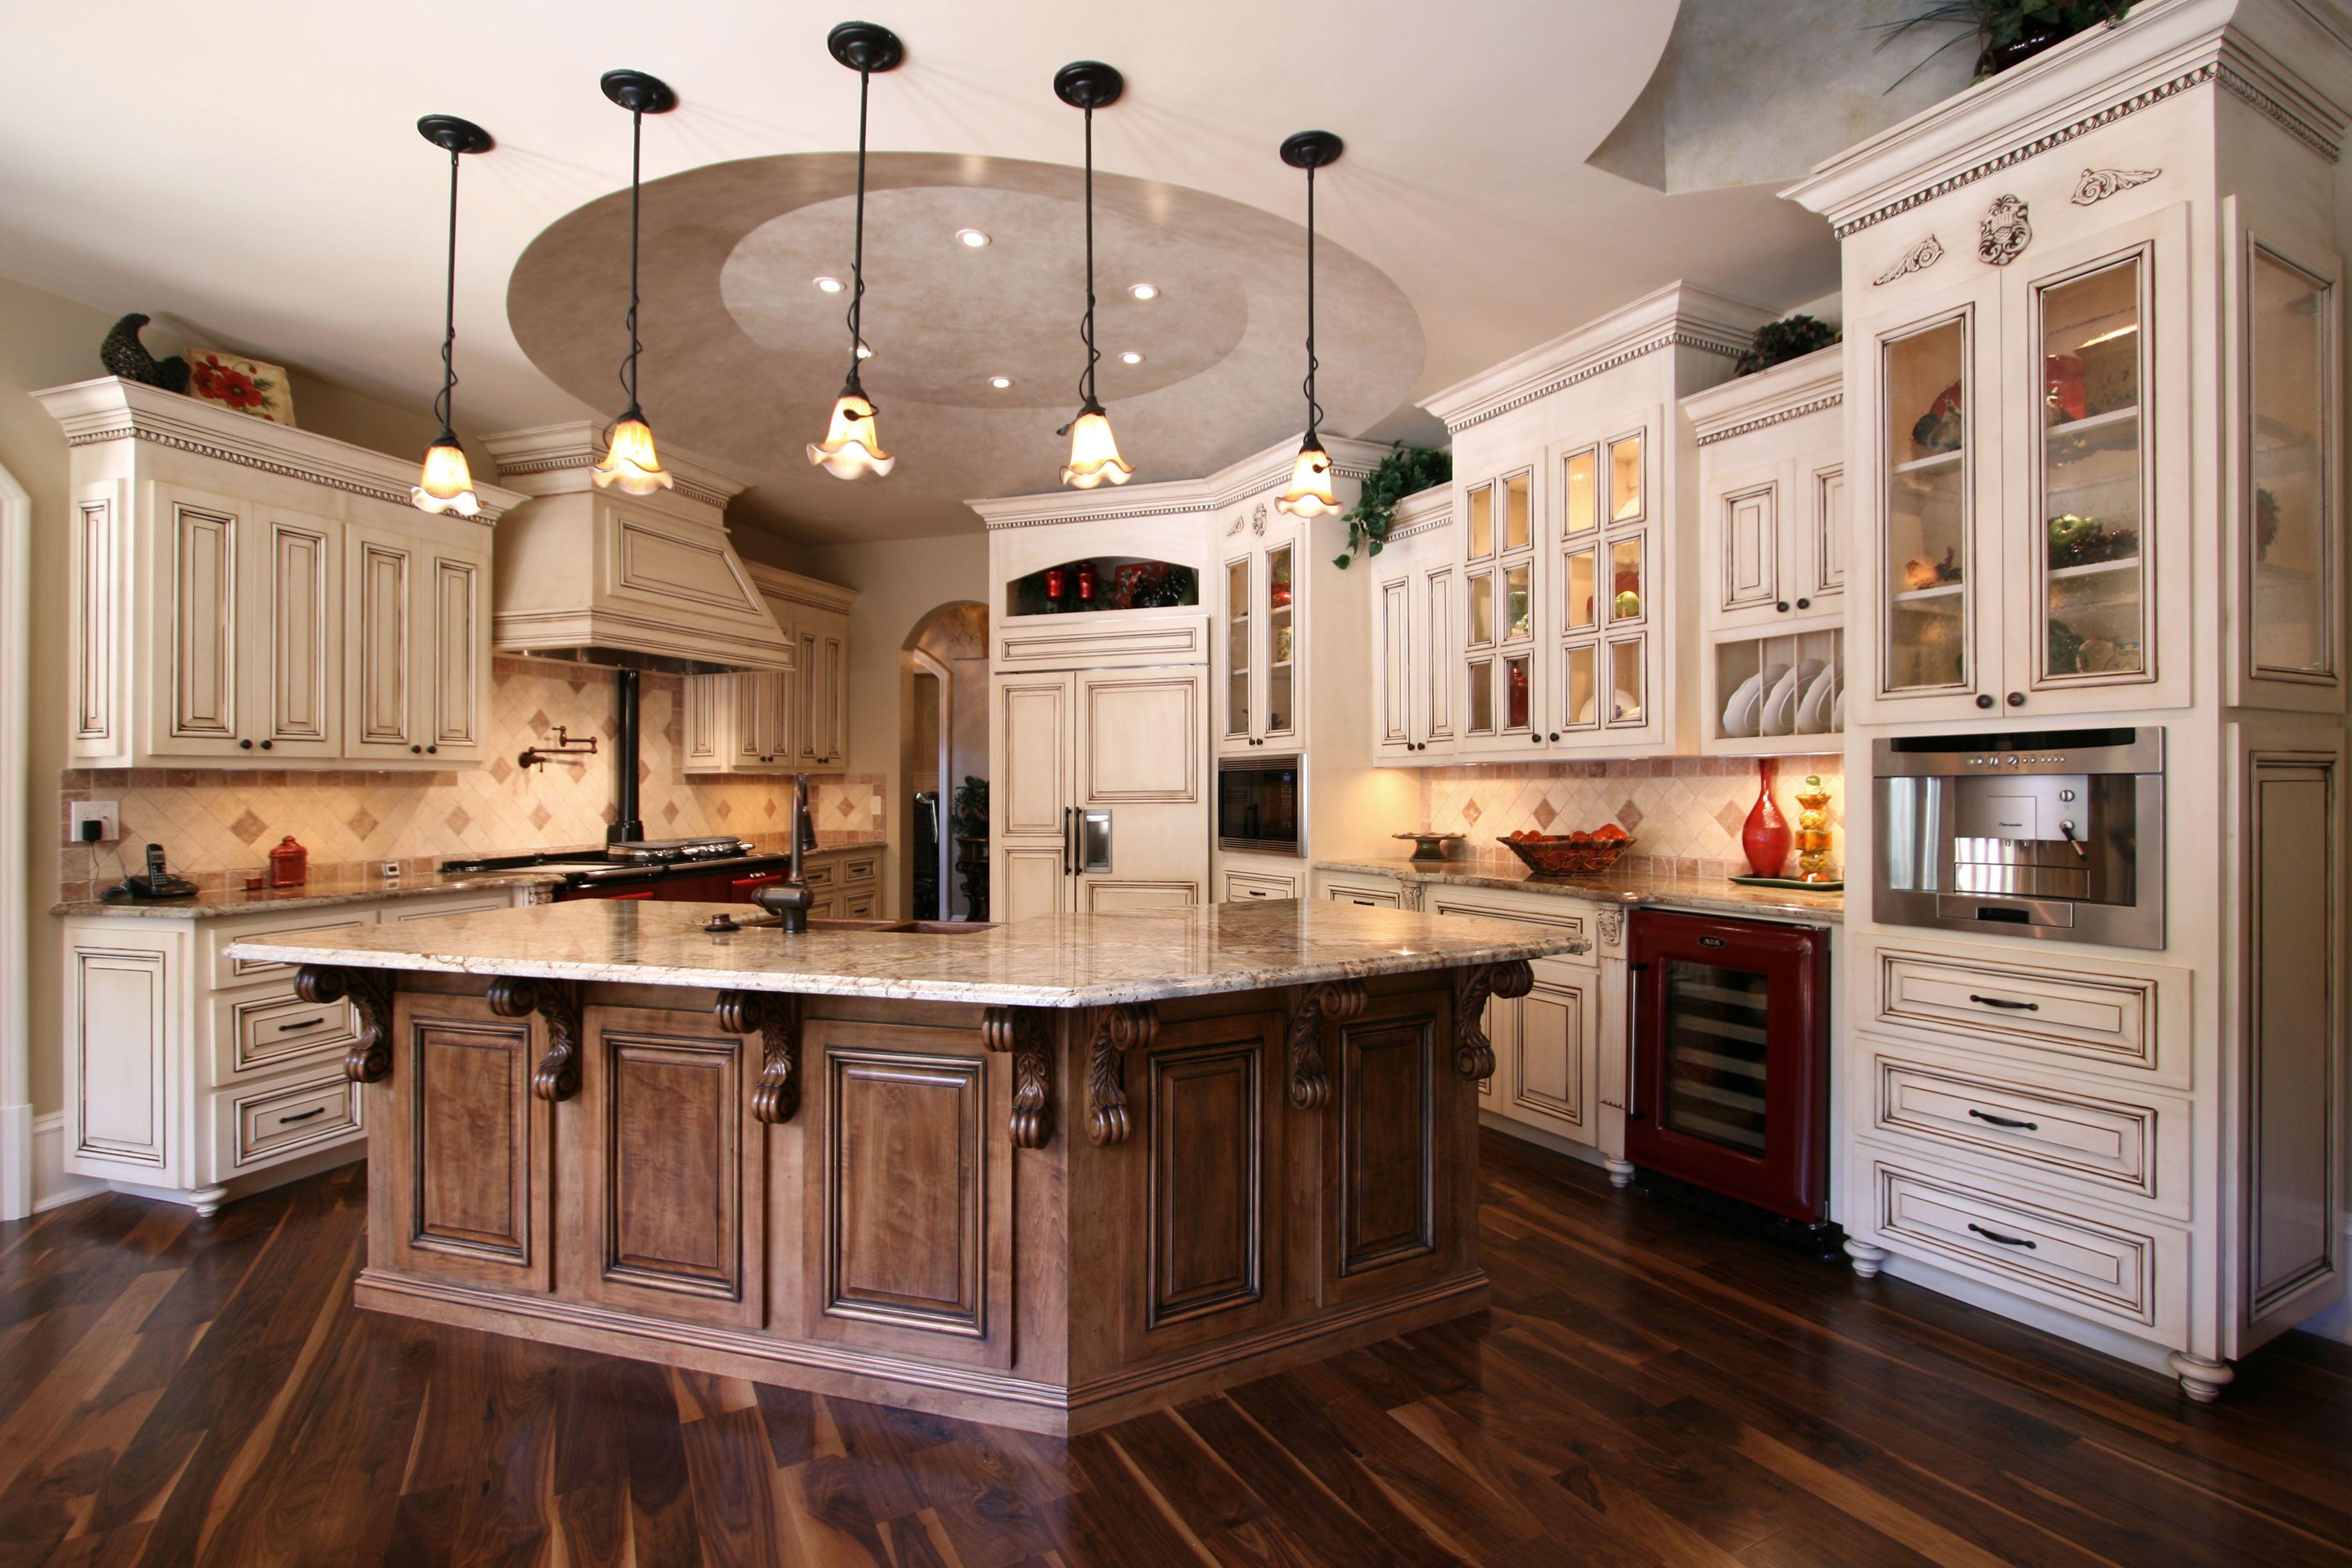 Kitchen Cabinets Short Pump Va & Kitchen Cabinets Short Pump Va | Kitchen Cabinets | Pinterest ...